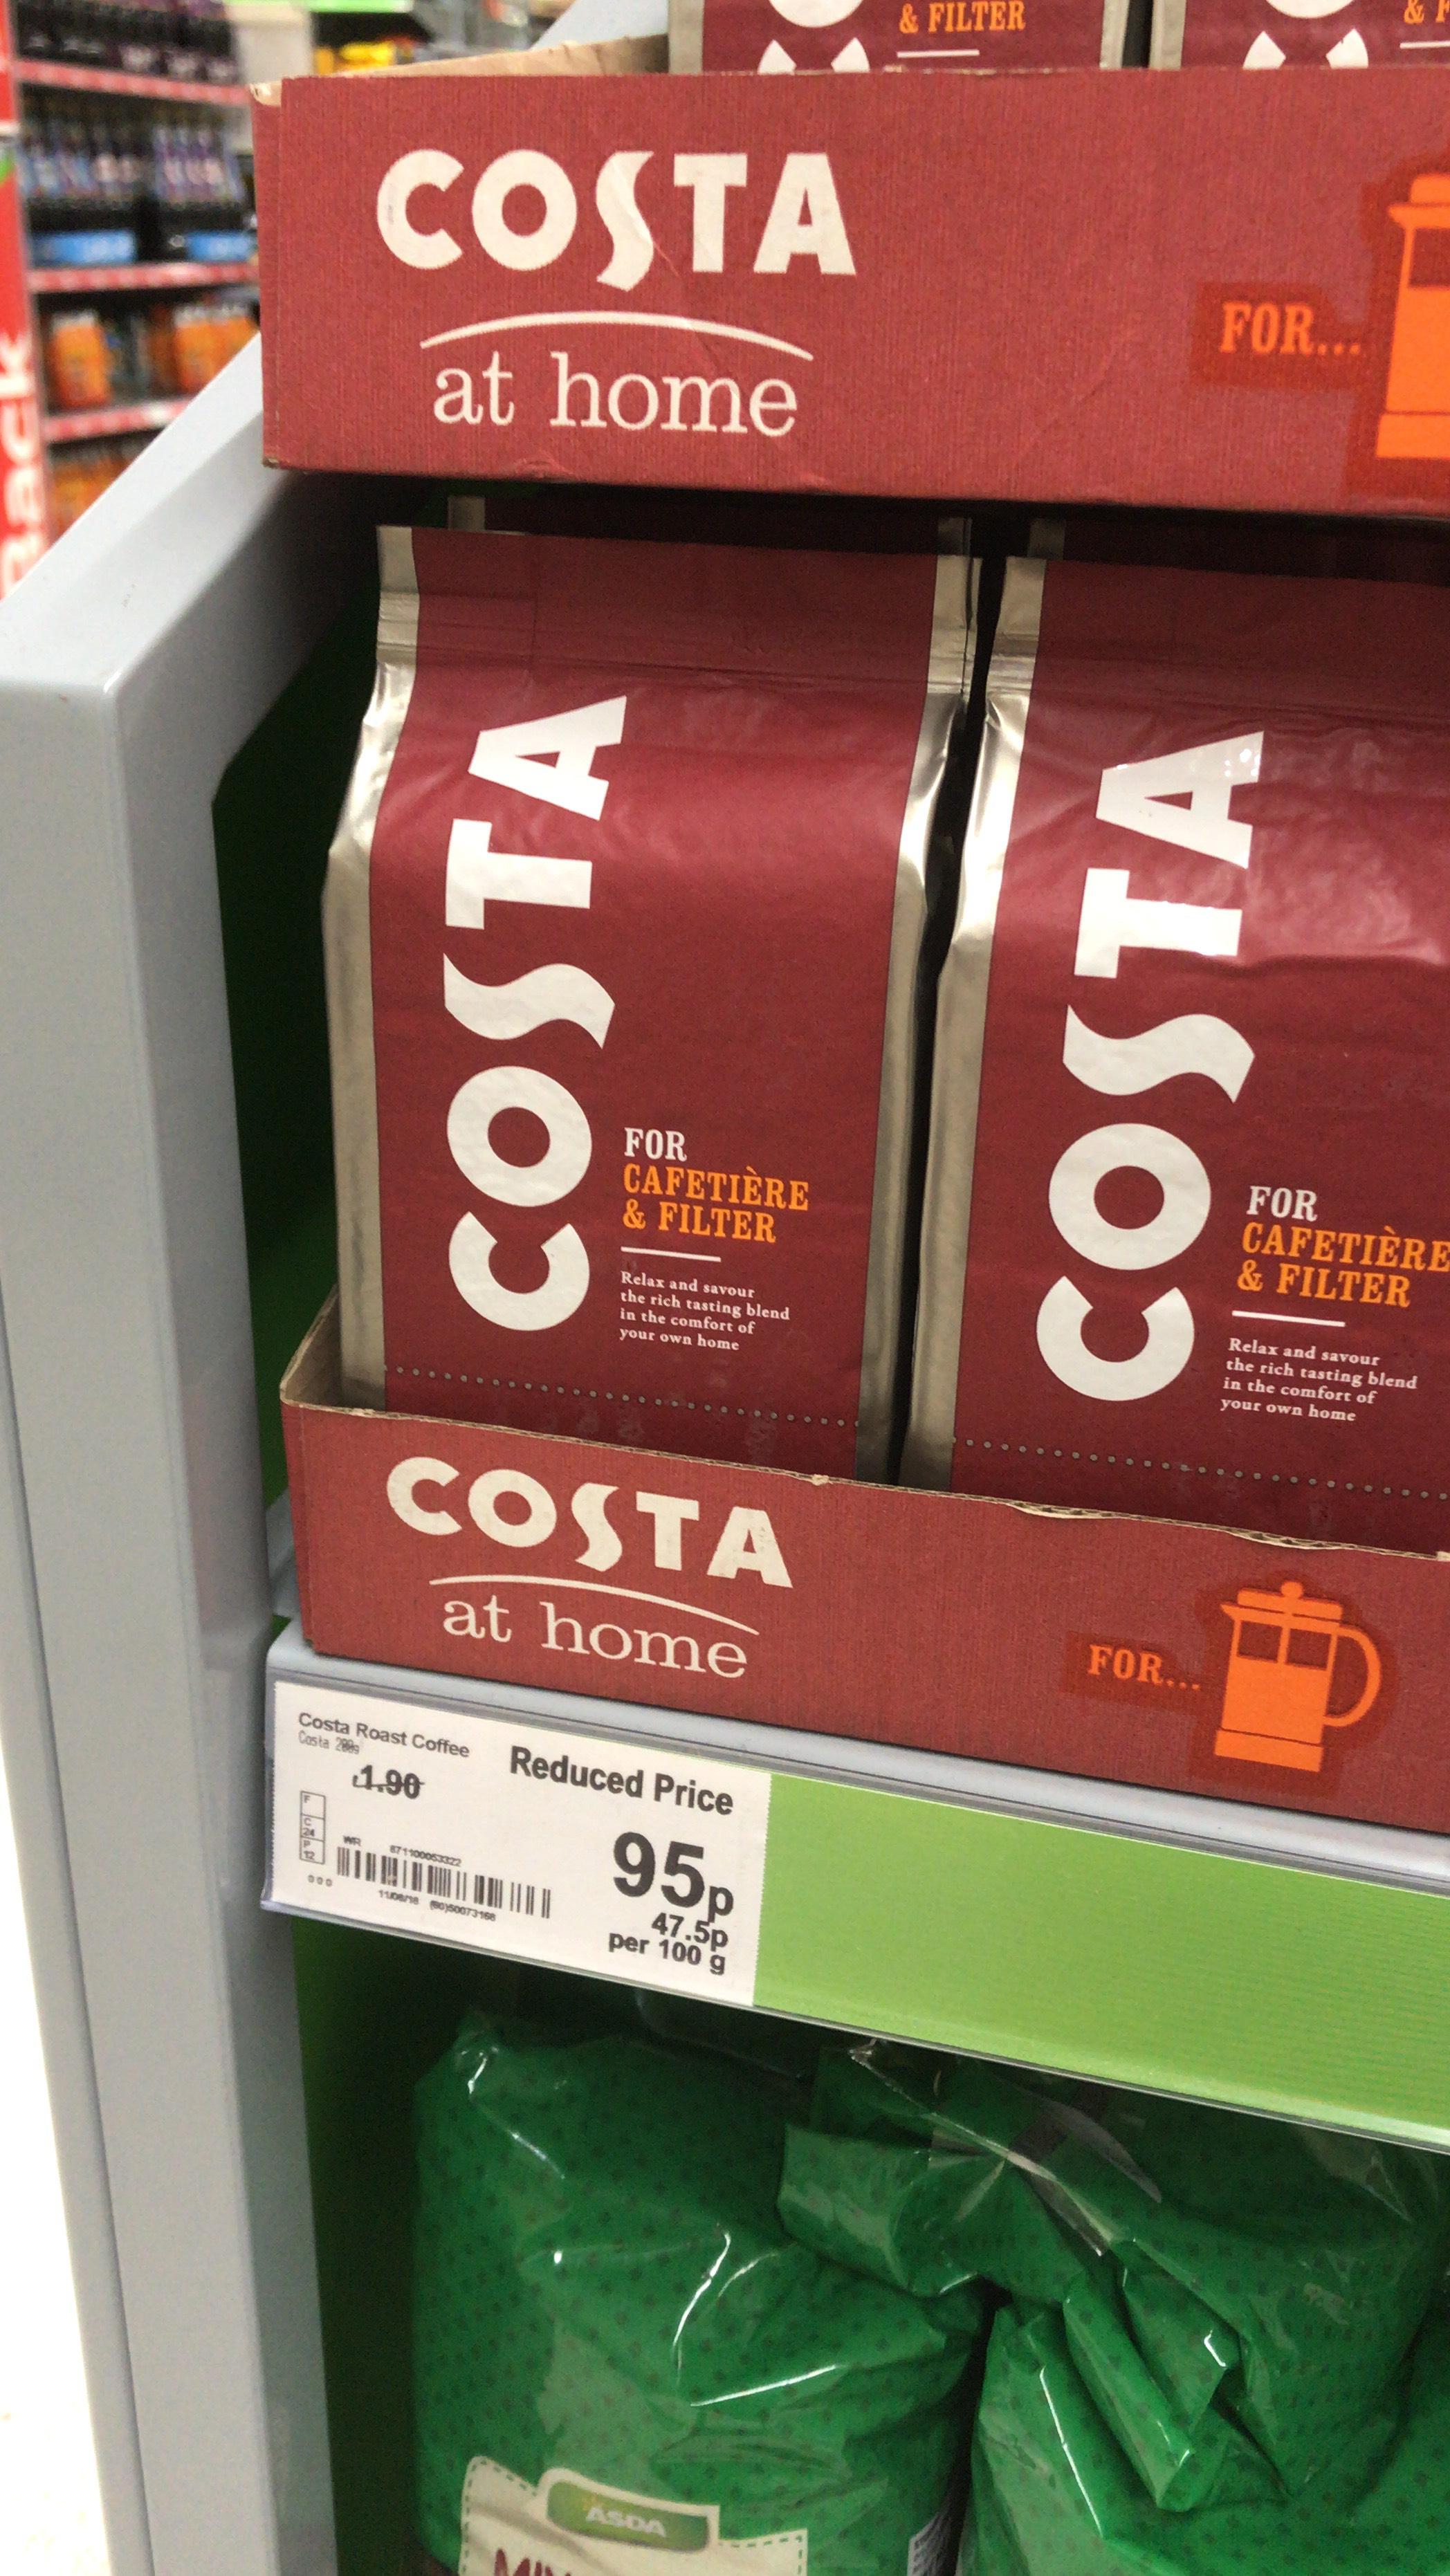 Costa filter coffee - 95p instore @ Asda